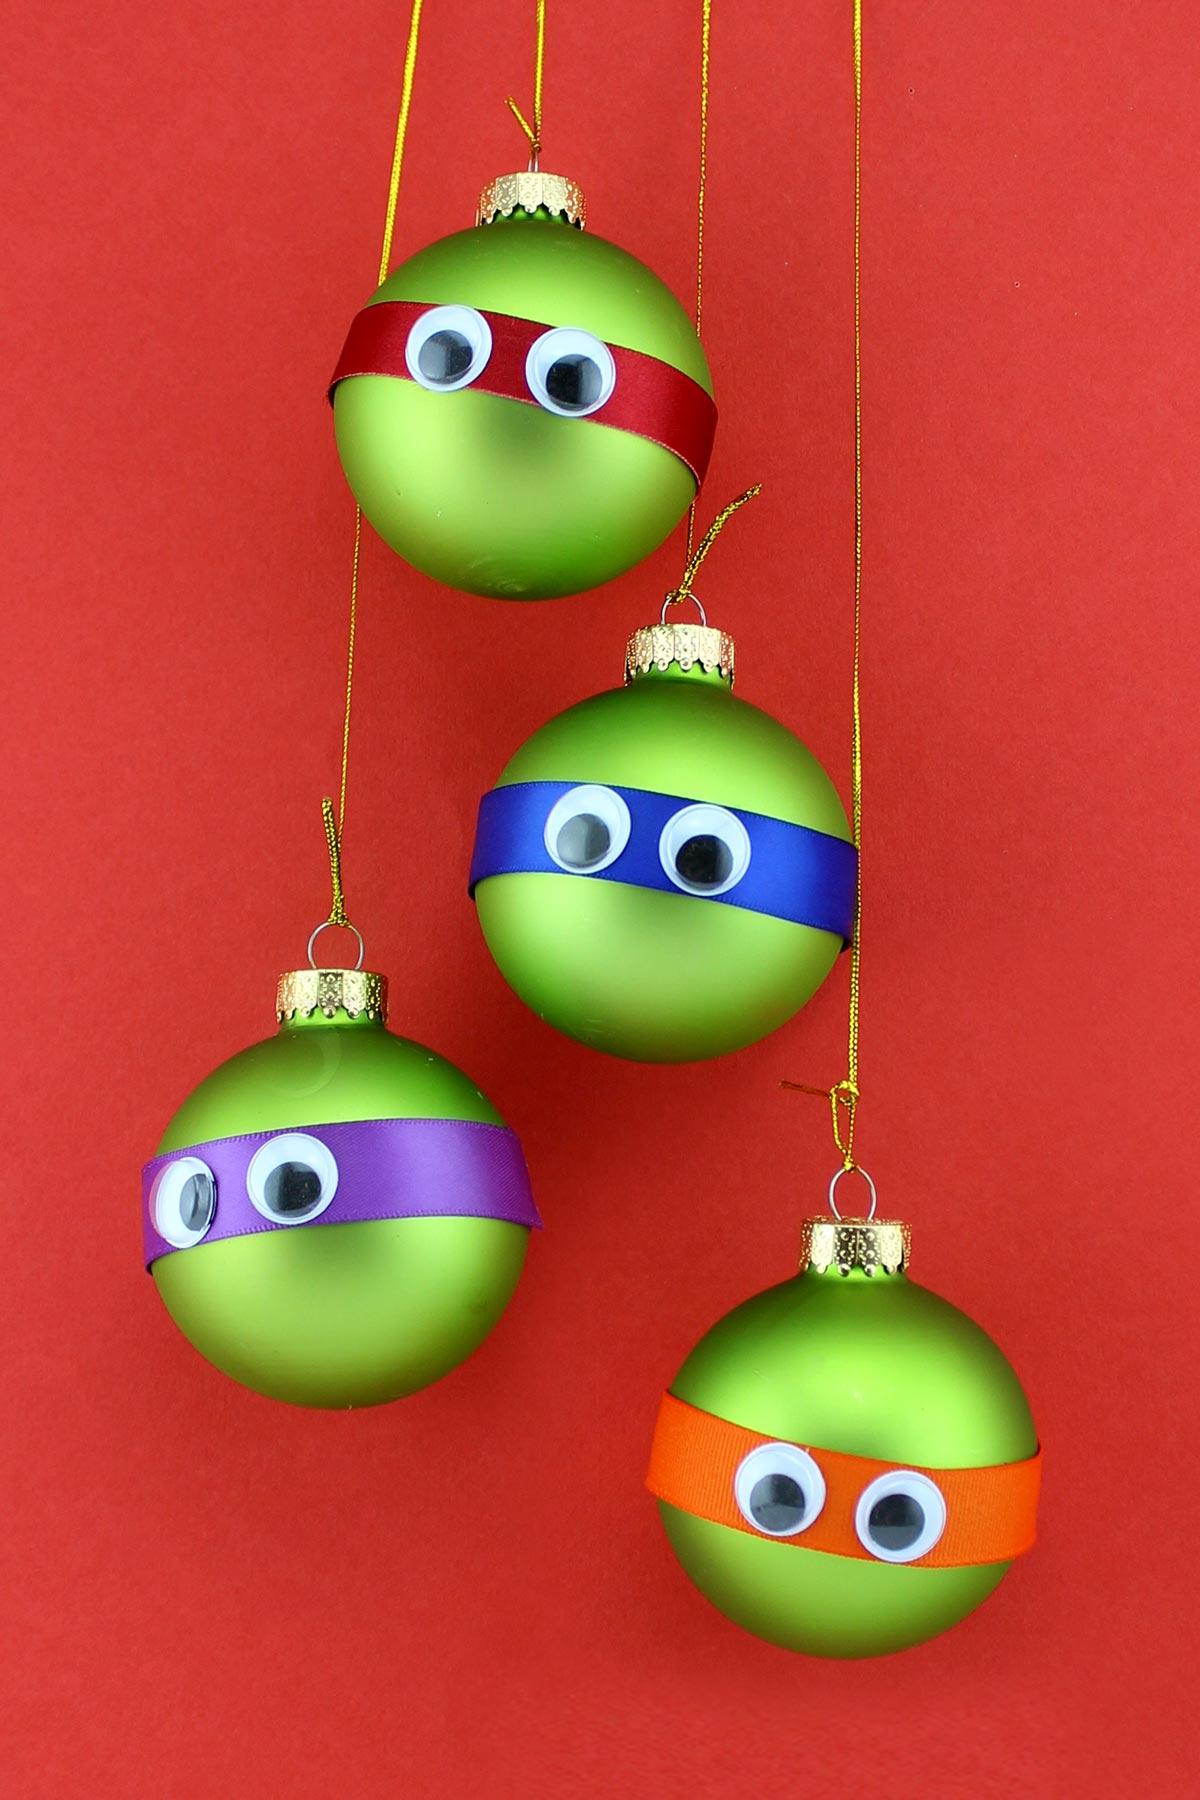 Teenage Mutant Ninja Turtle Googly-eyed Ornaments | Nickelodeon Parents